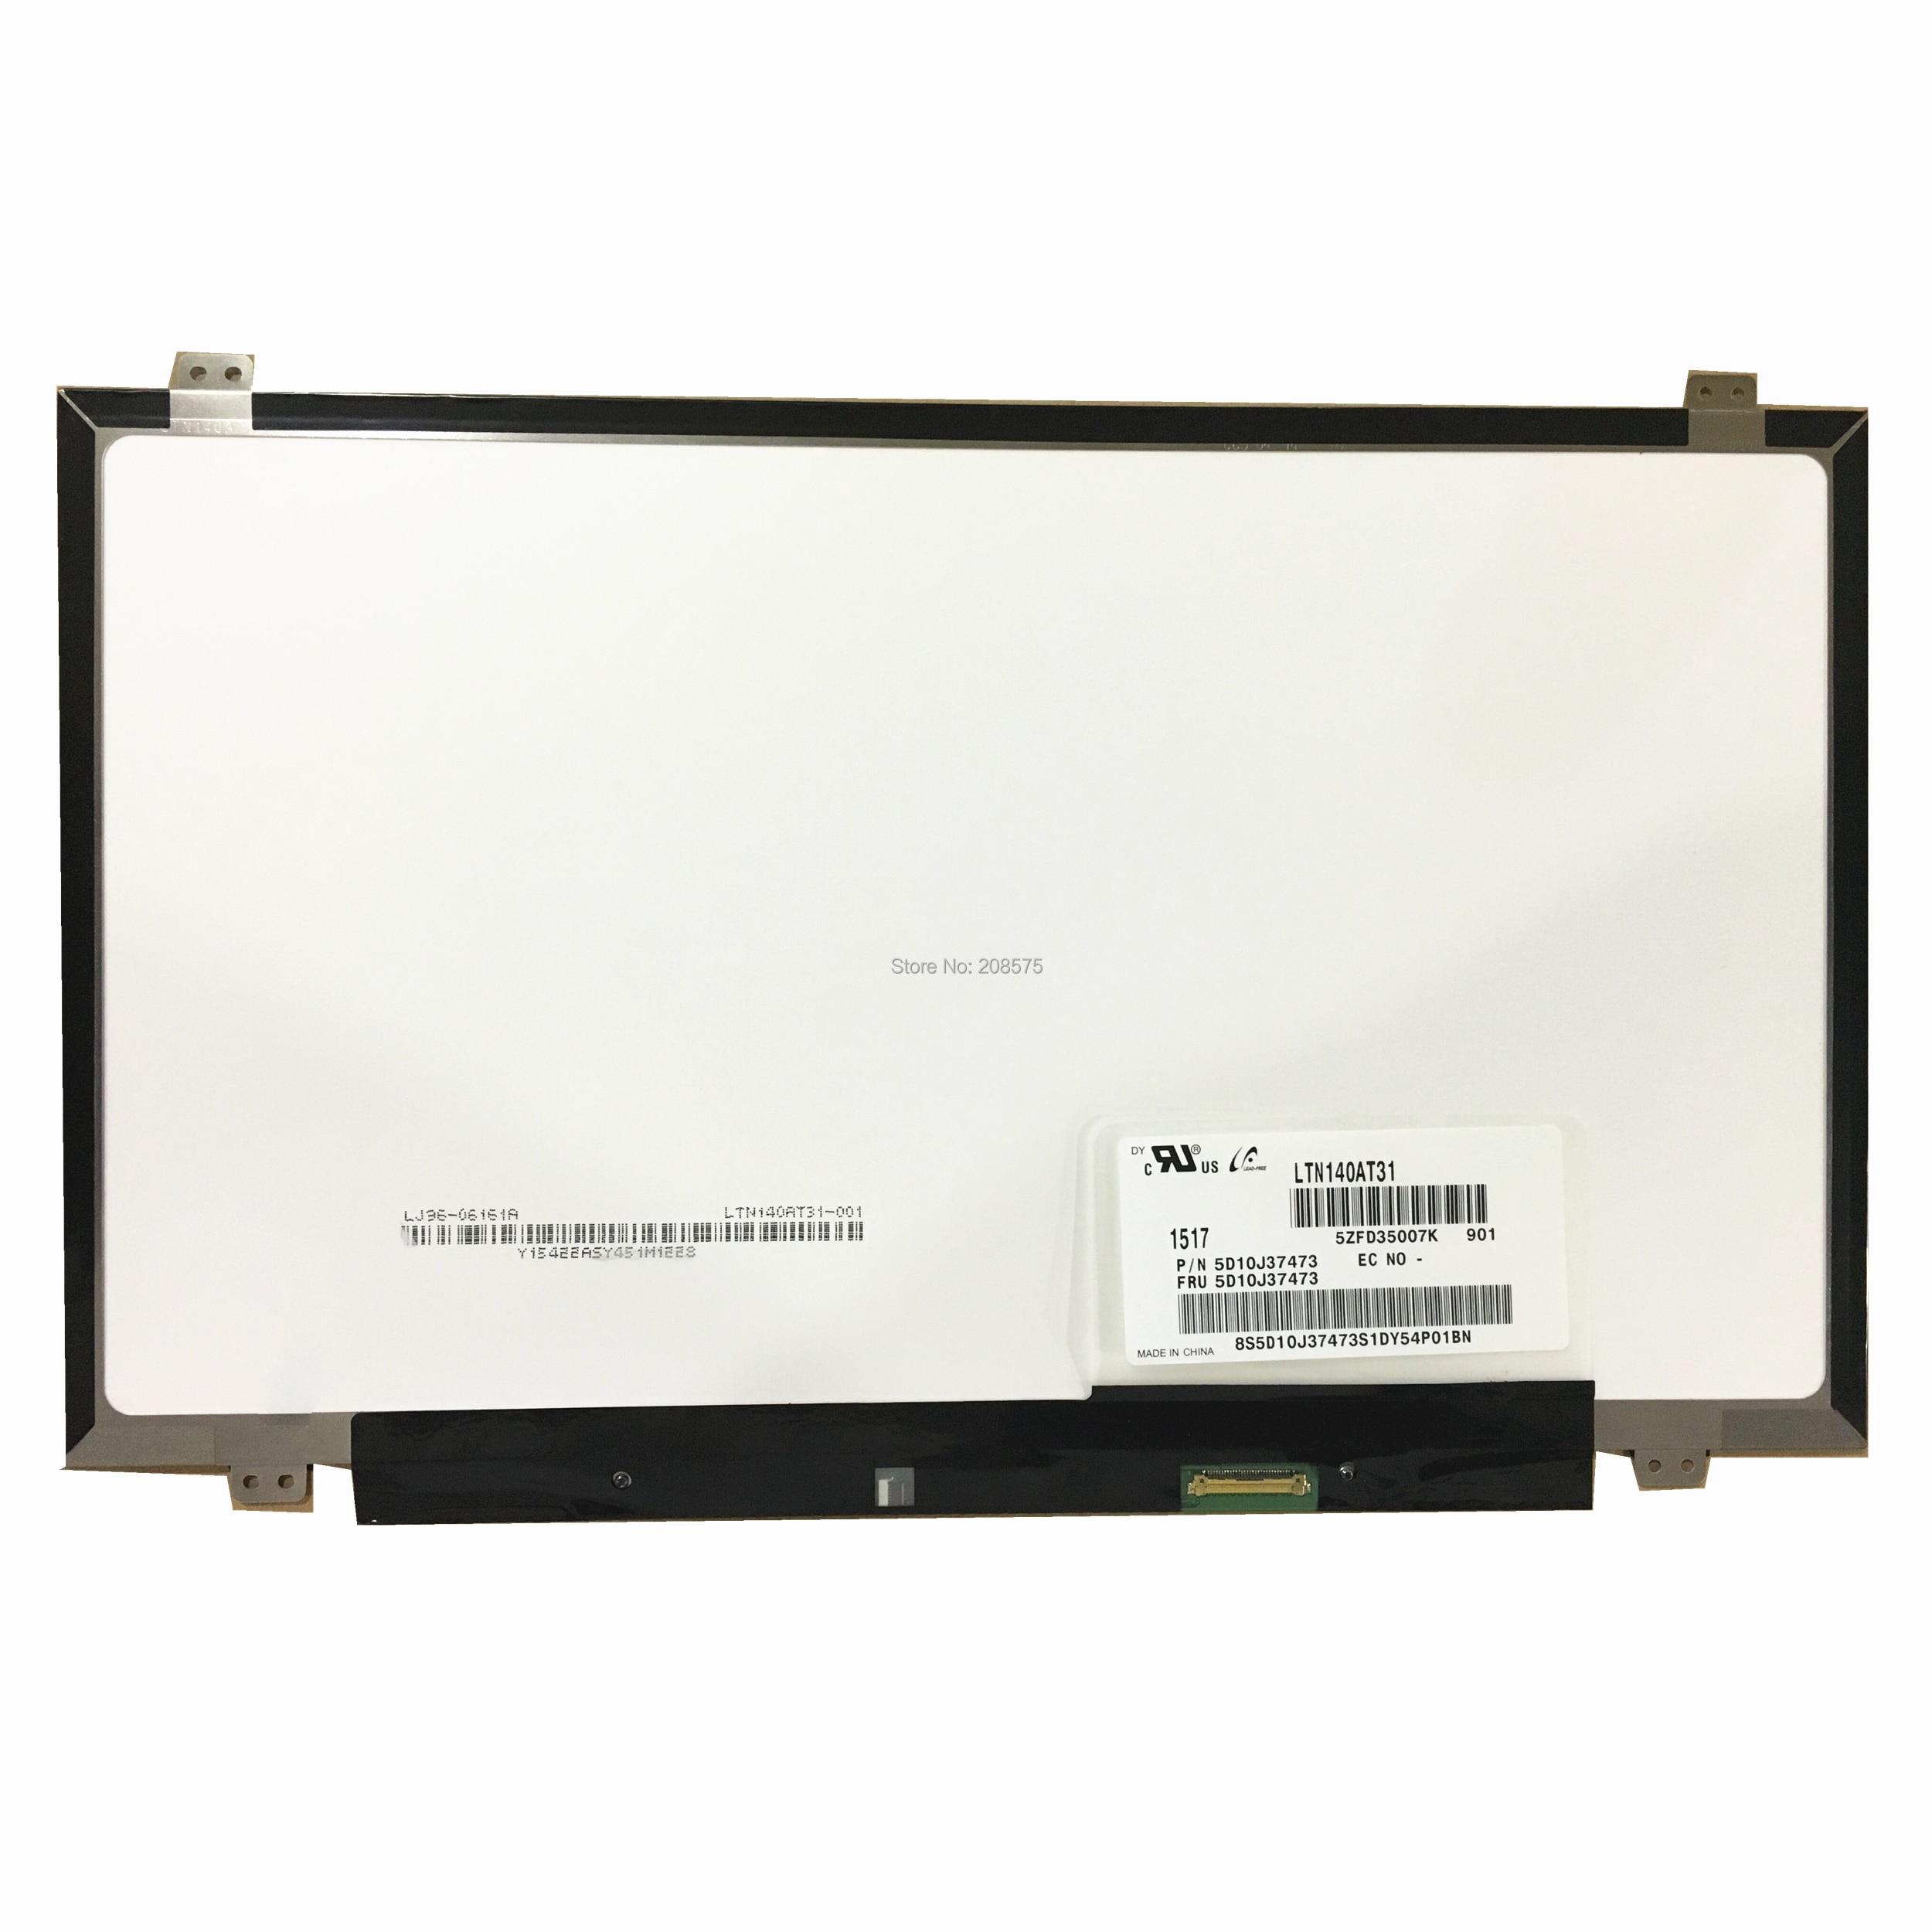 Free shipping LTN140AT31 N140BGE-E43 N140BGE-E33 HB140WX1-301 HB140WX1-601 B140XTN03.2 Laptop lcd screen 1366*768 EDP 30pinsFree shipping LTN140AT31 N140BGE-E43 N140BGE-E33 HB140WX1-301 HB140WX1-601 B140XTN03.2 Laptop lcd screen 1366*768 EDP 30pins